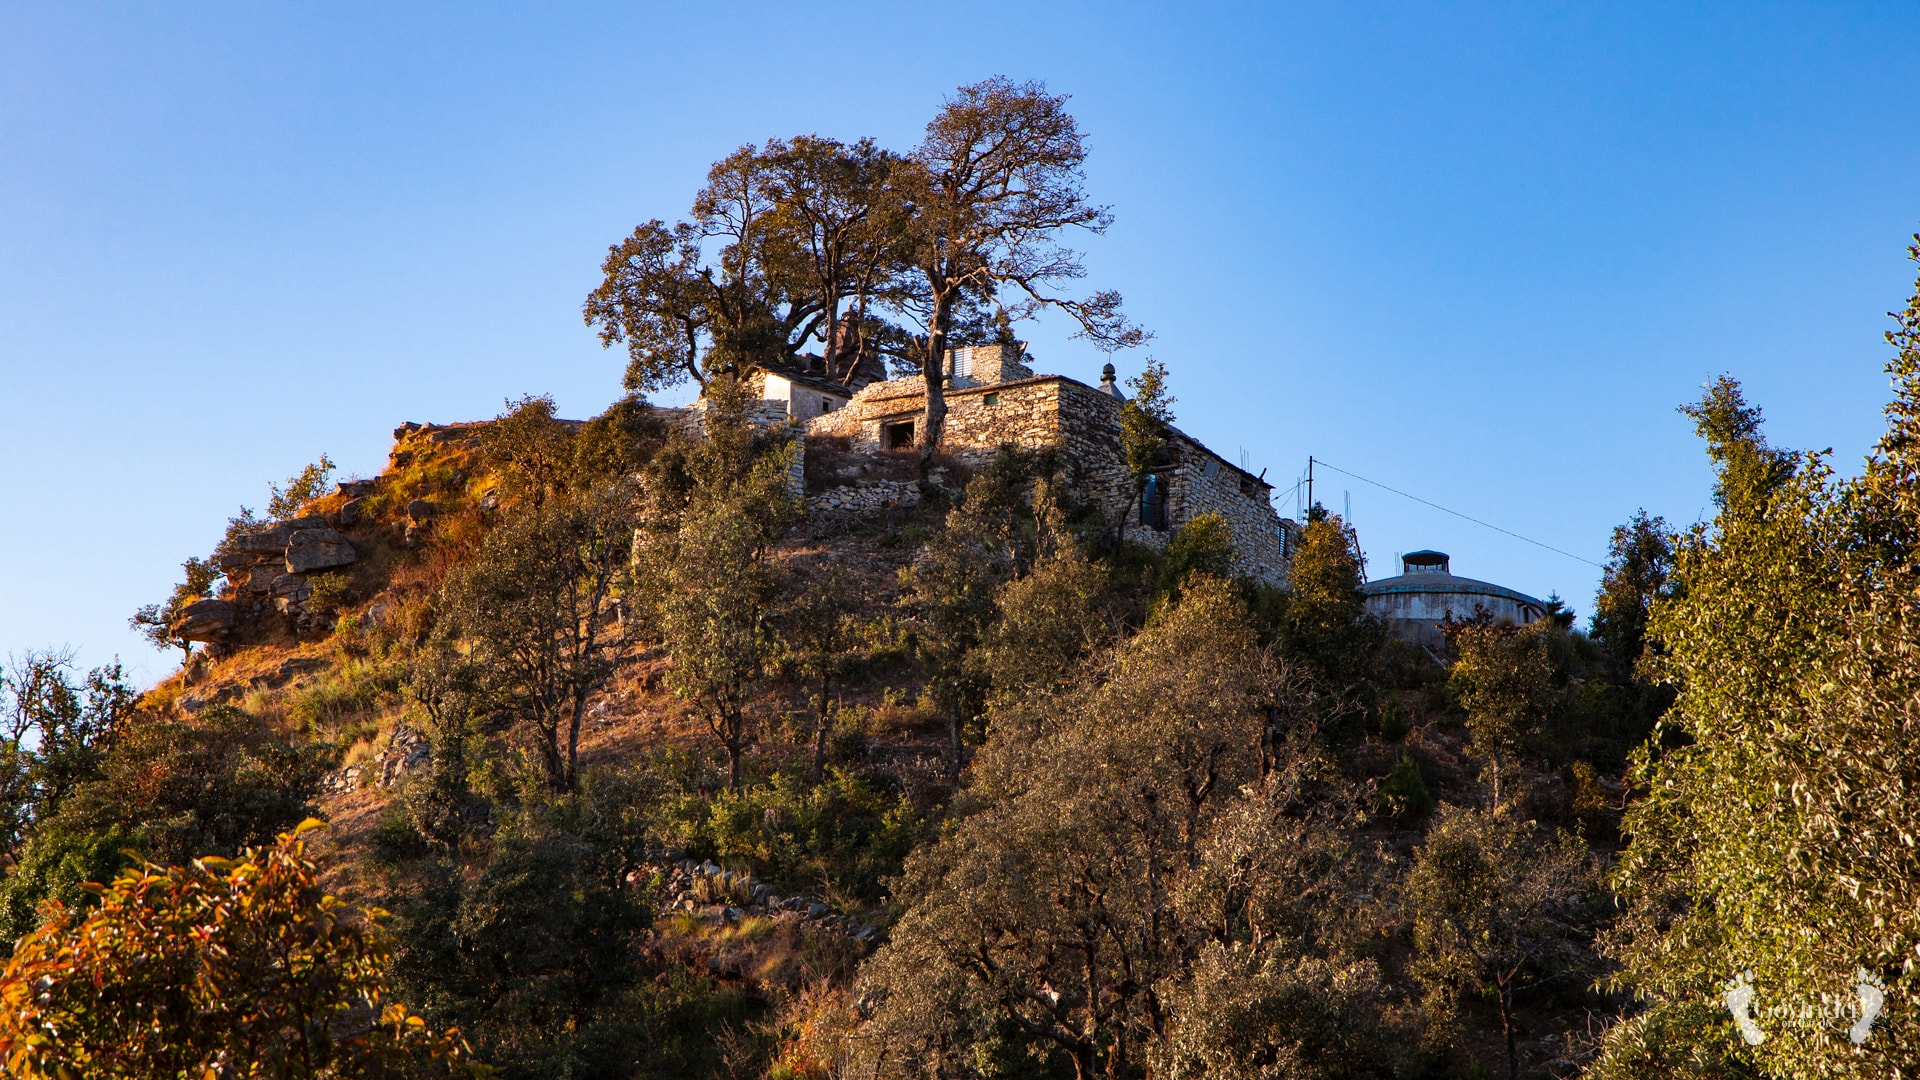 Ma Sukhadevi Mandir - Birthplace of Kind Bharat (King of India)